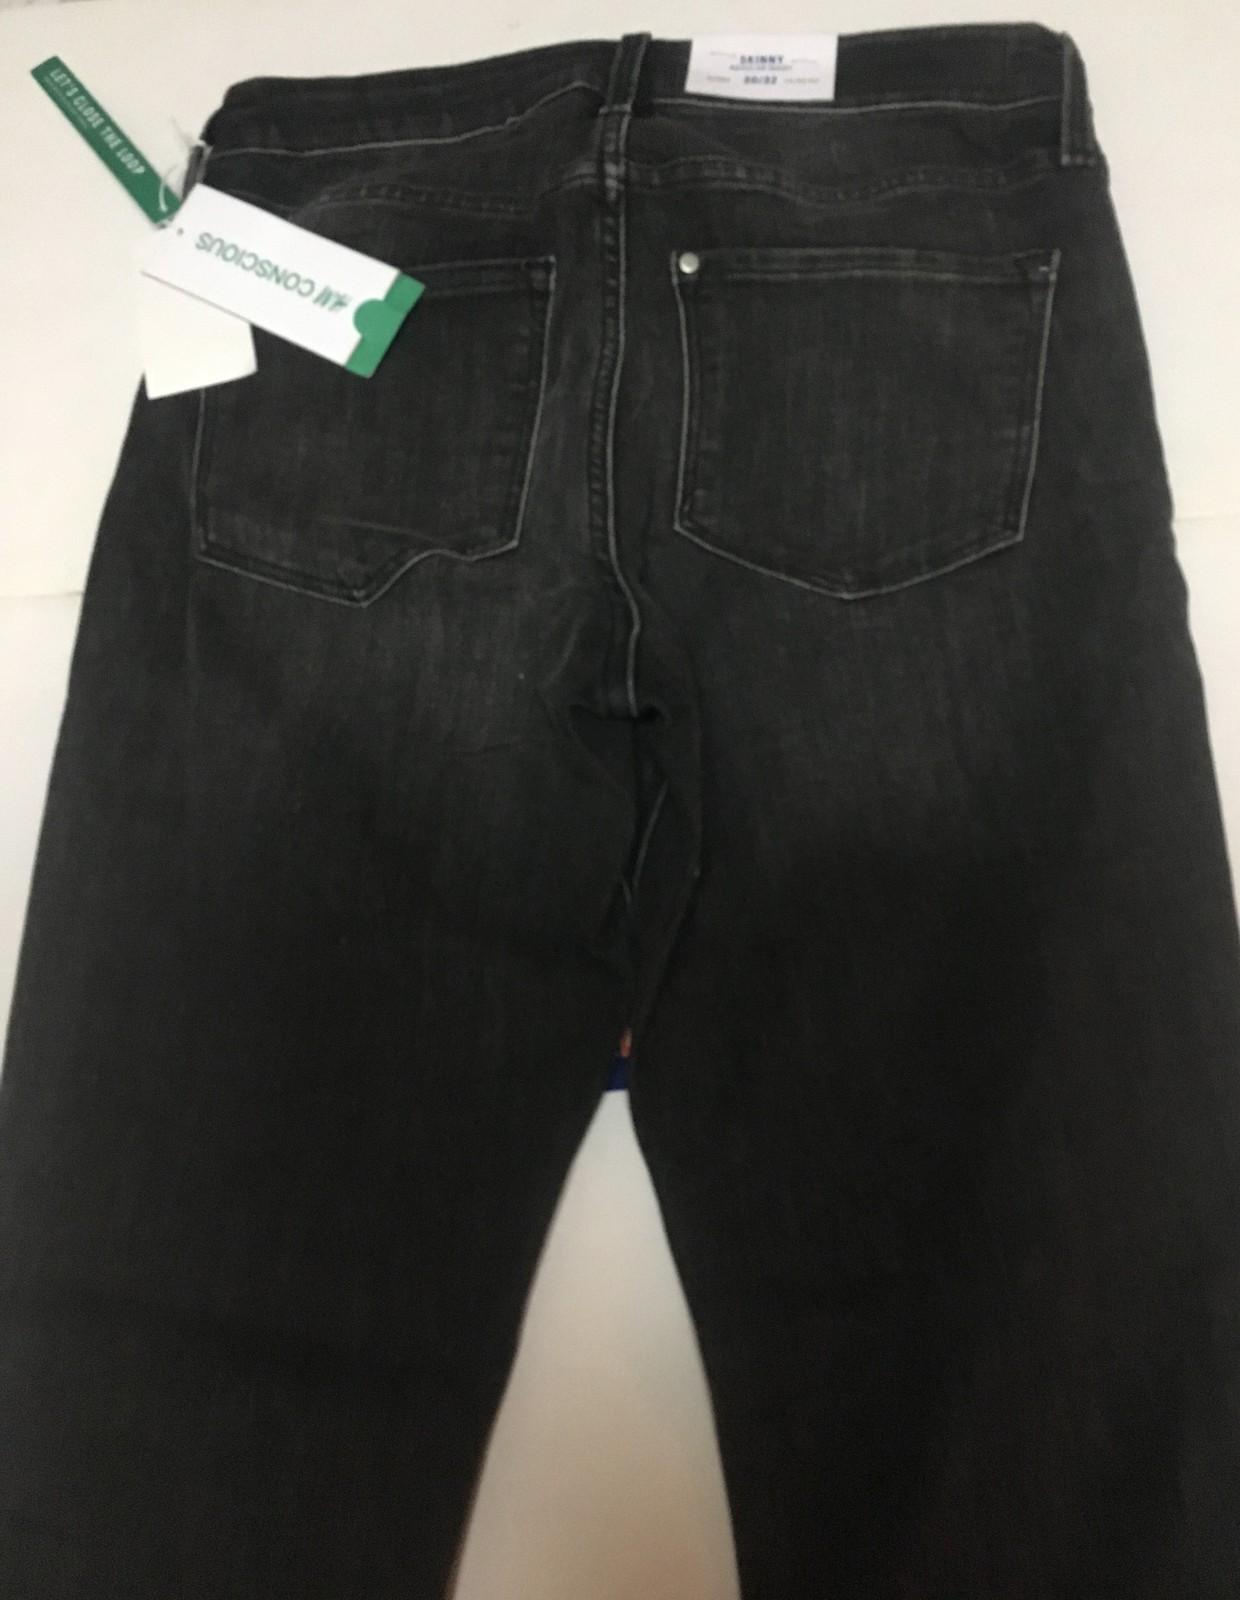 H&M Black Skinny Jeans Sz 30/32 Women